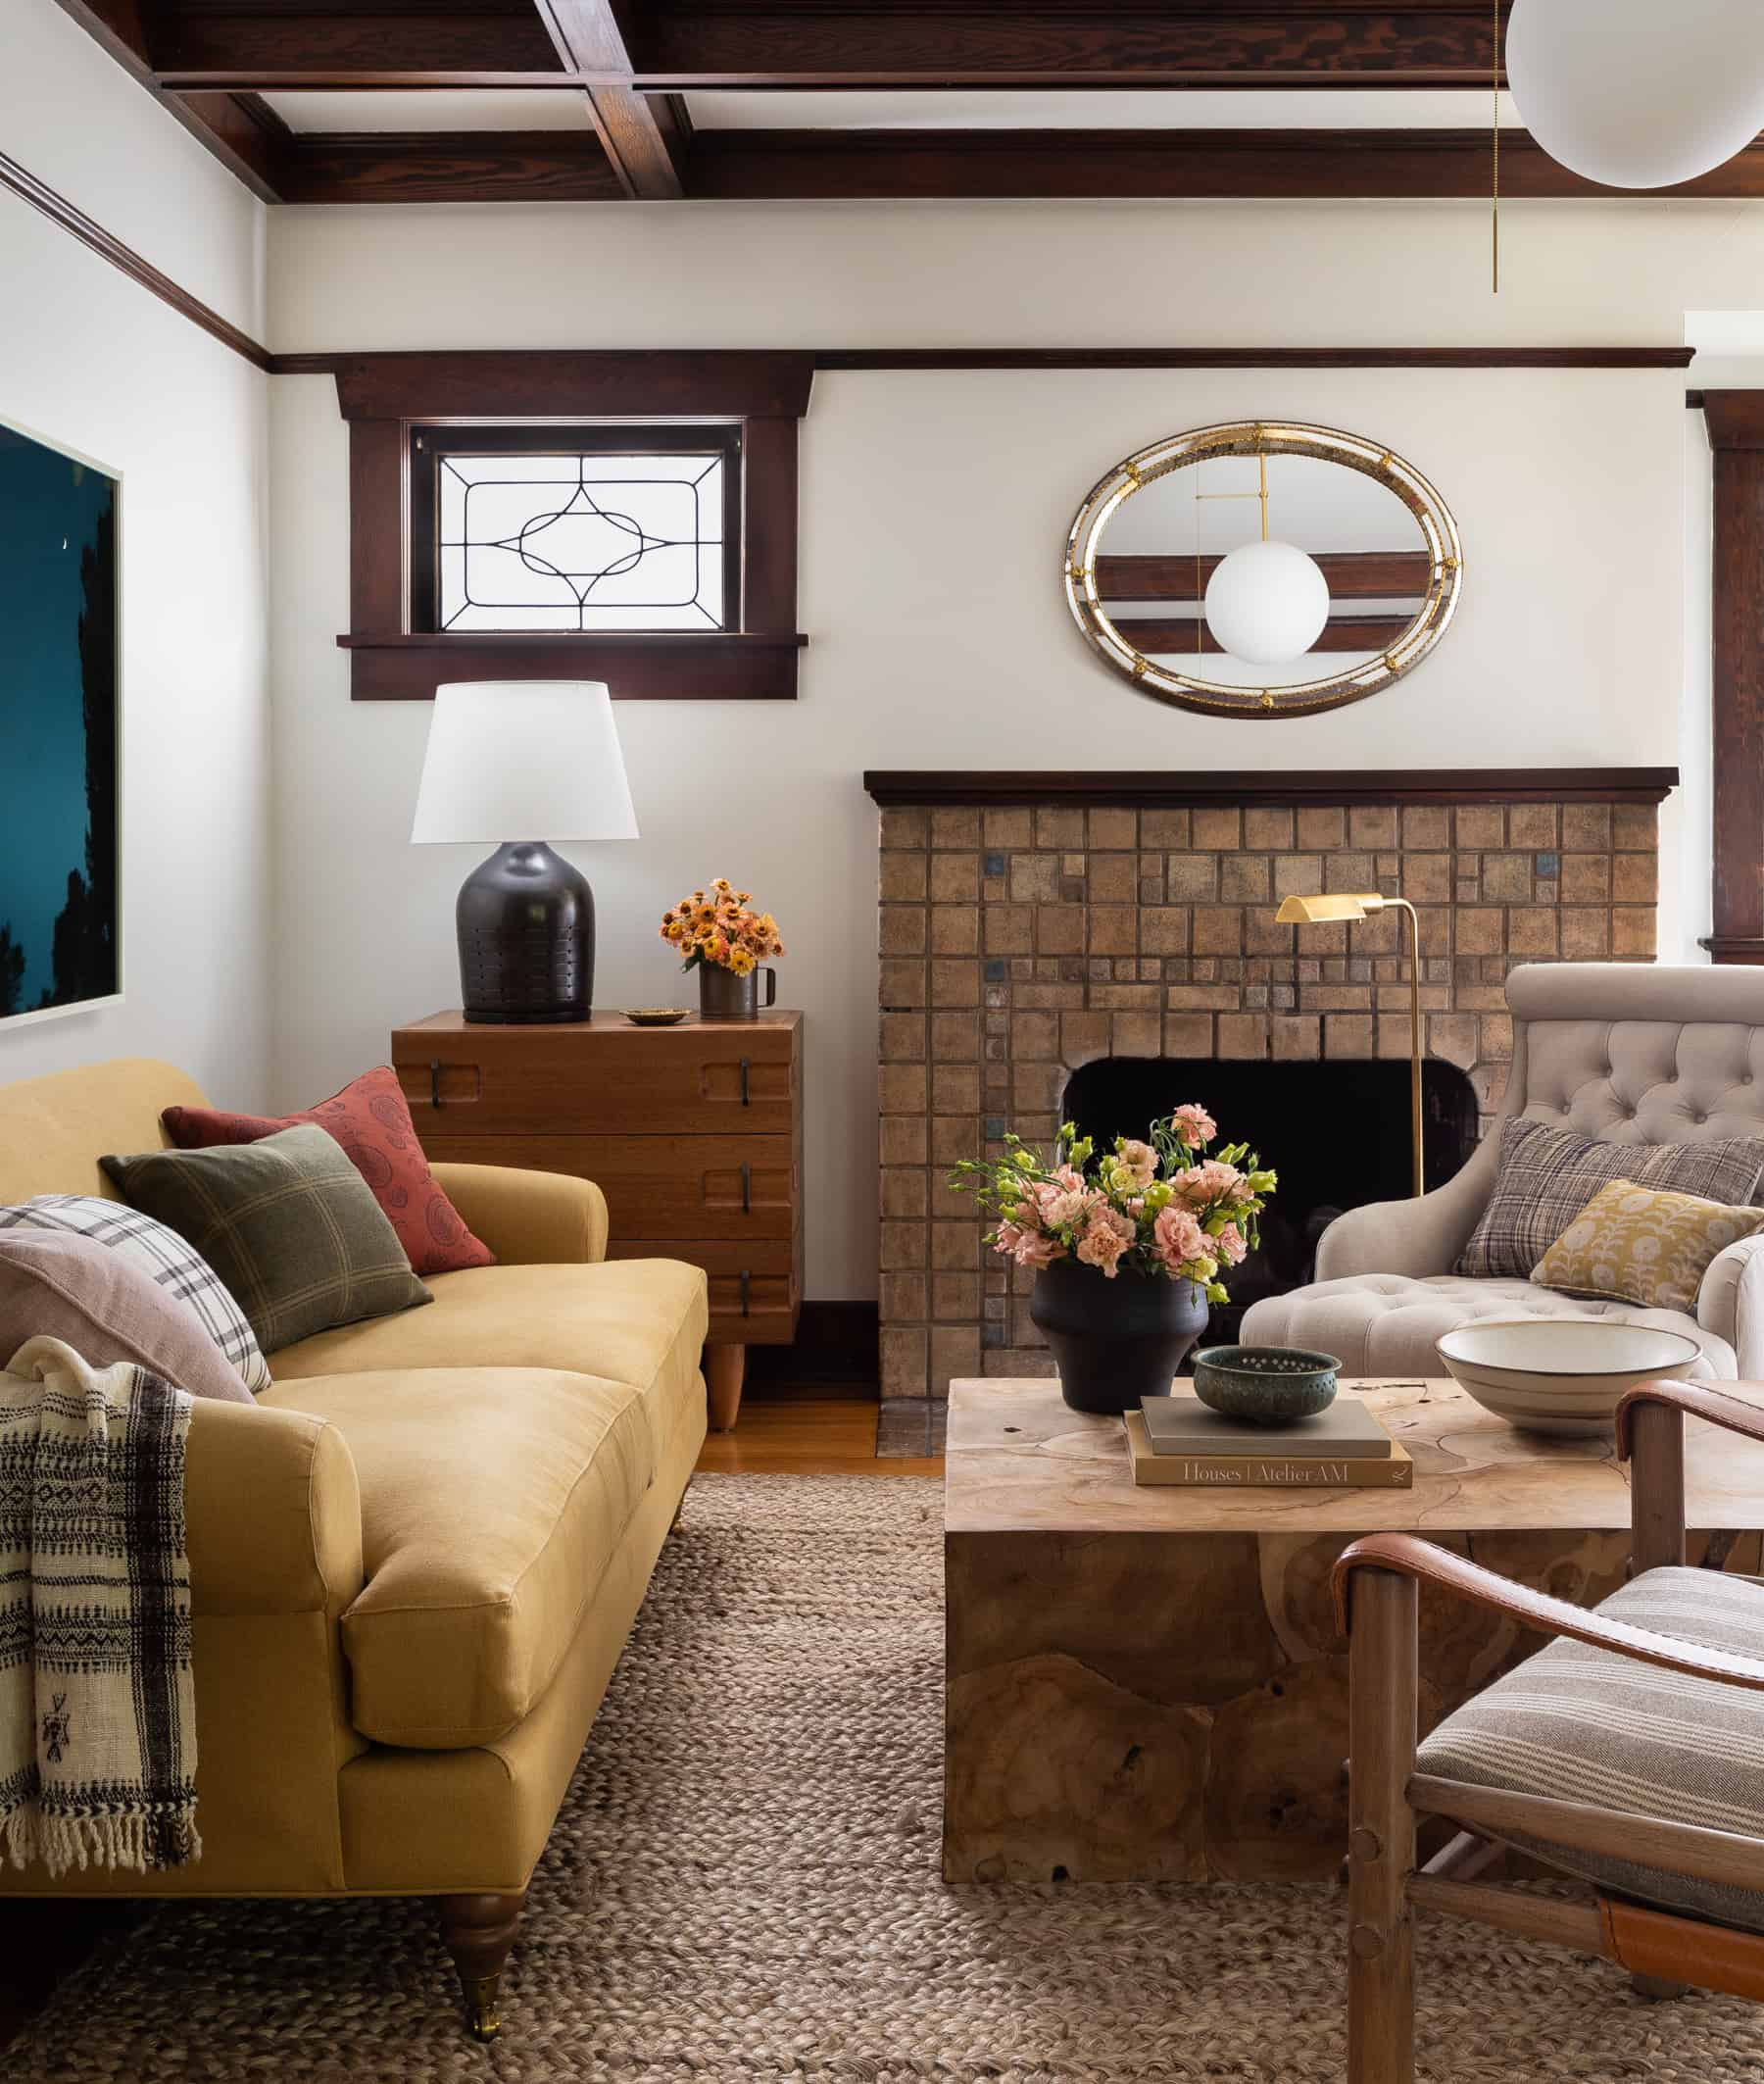 Seattle-interior-designer-Heidi-Caillier-Design-dining-room ...